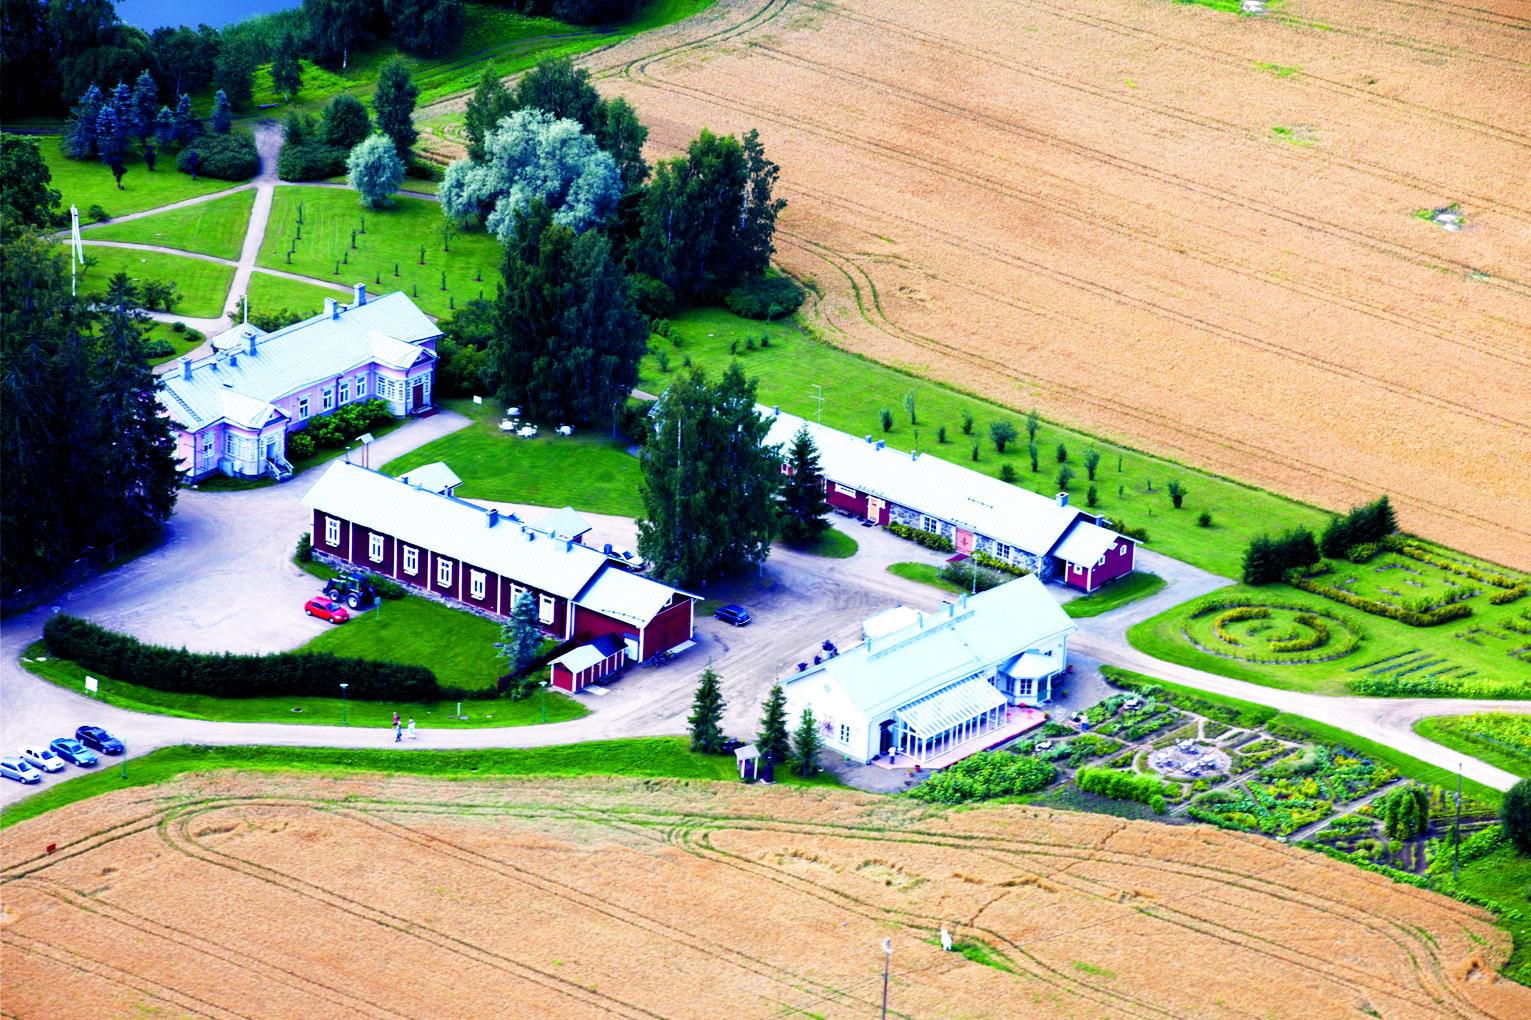 Tertti Manor travel company in Mikkeli, Saimaa, Finland